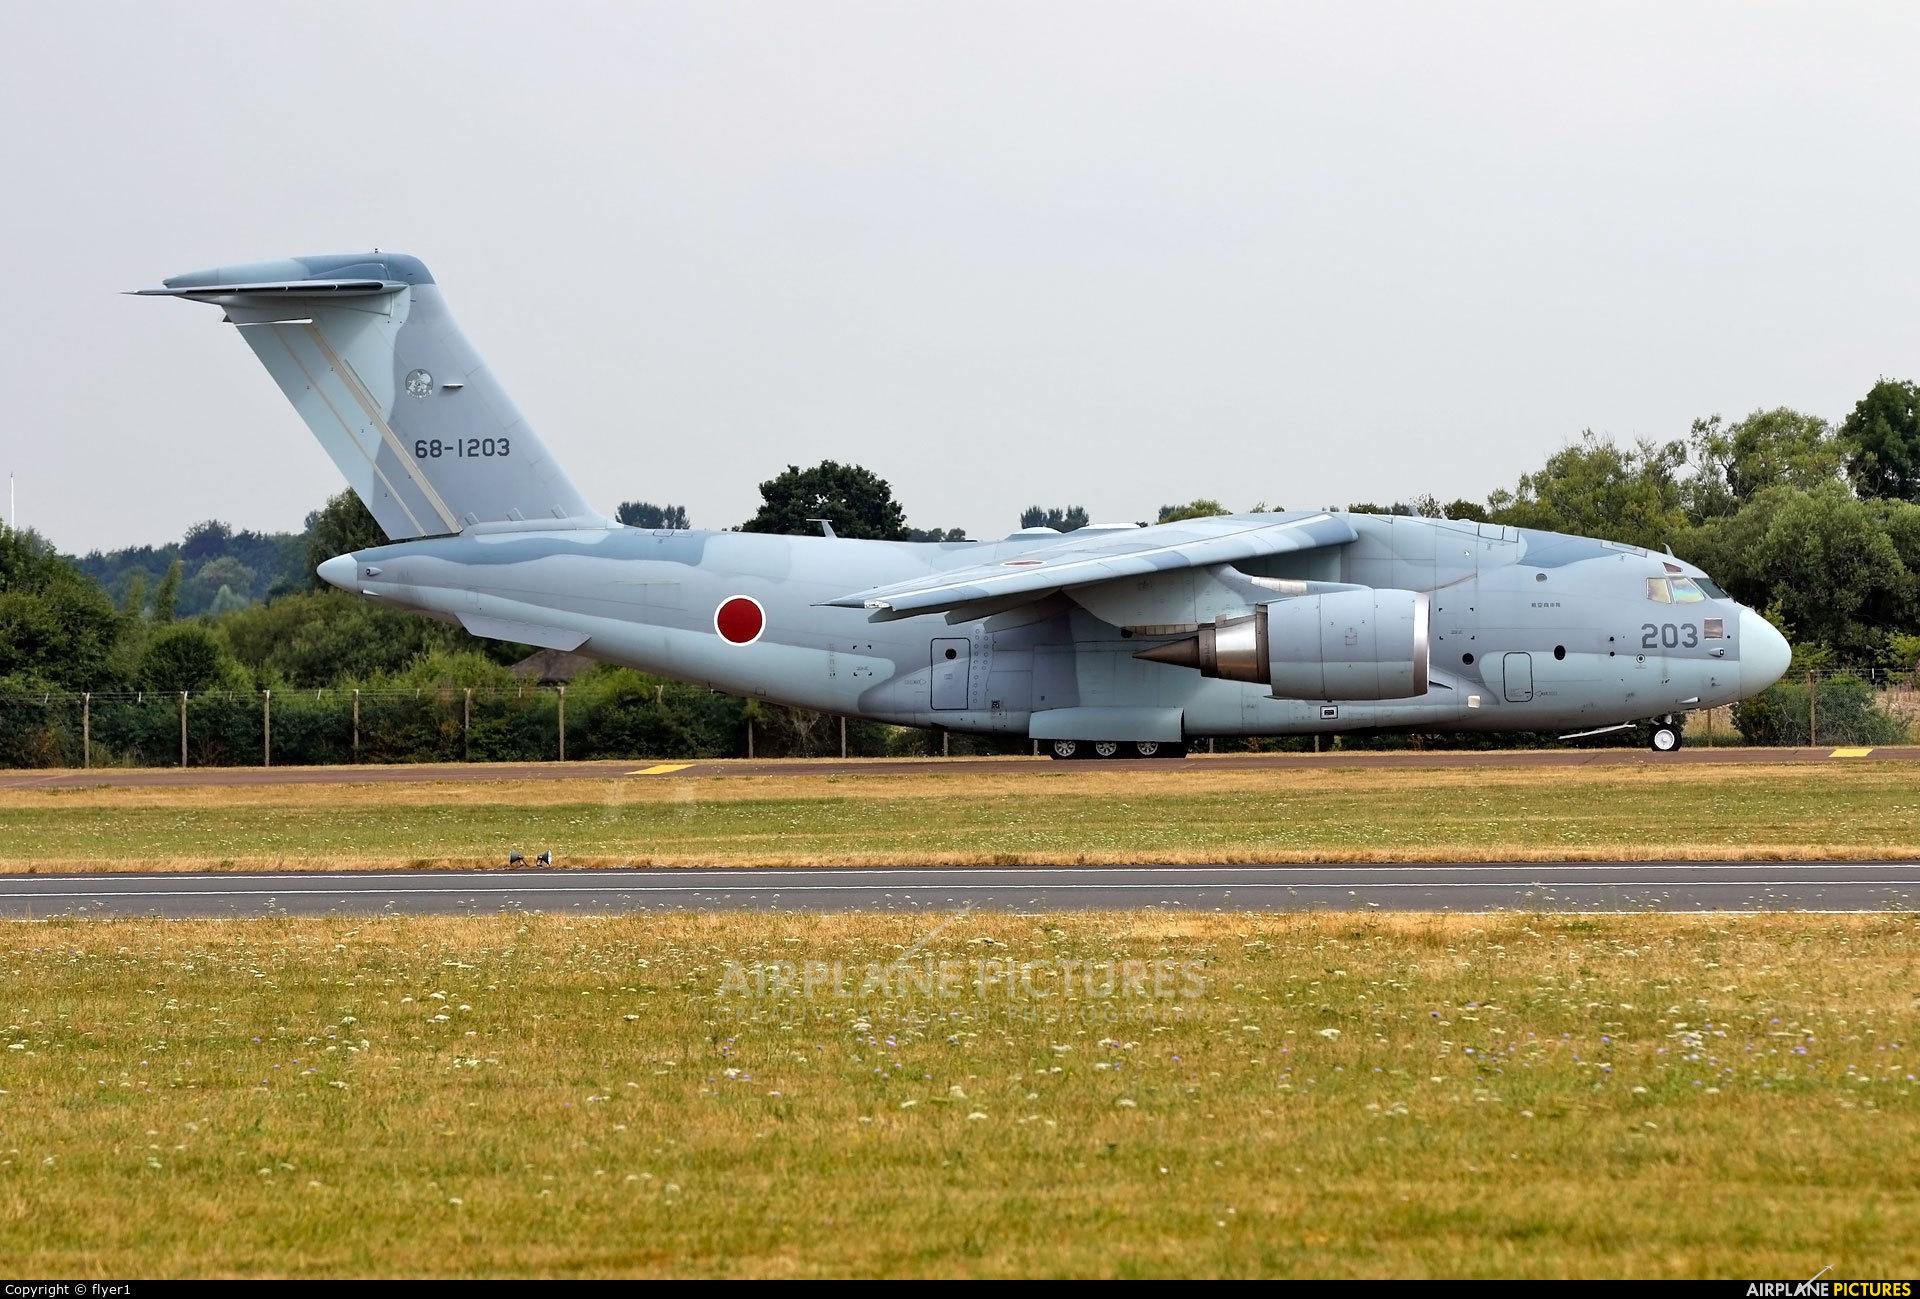 Japan - Air Self Defence Force 68-1203 aircraft at Fairford